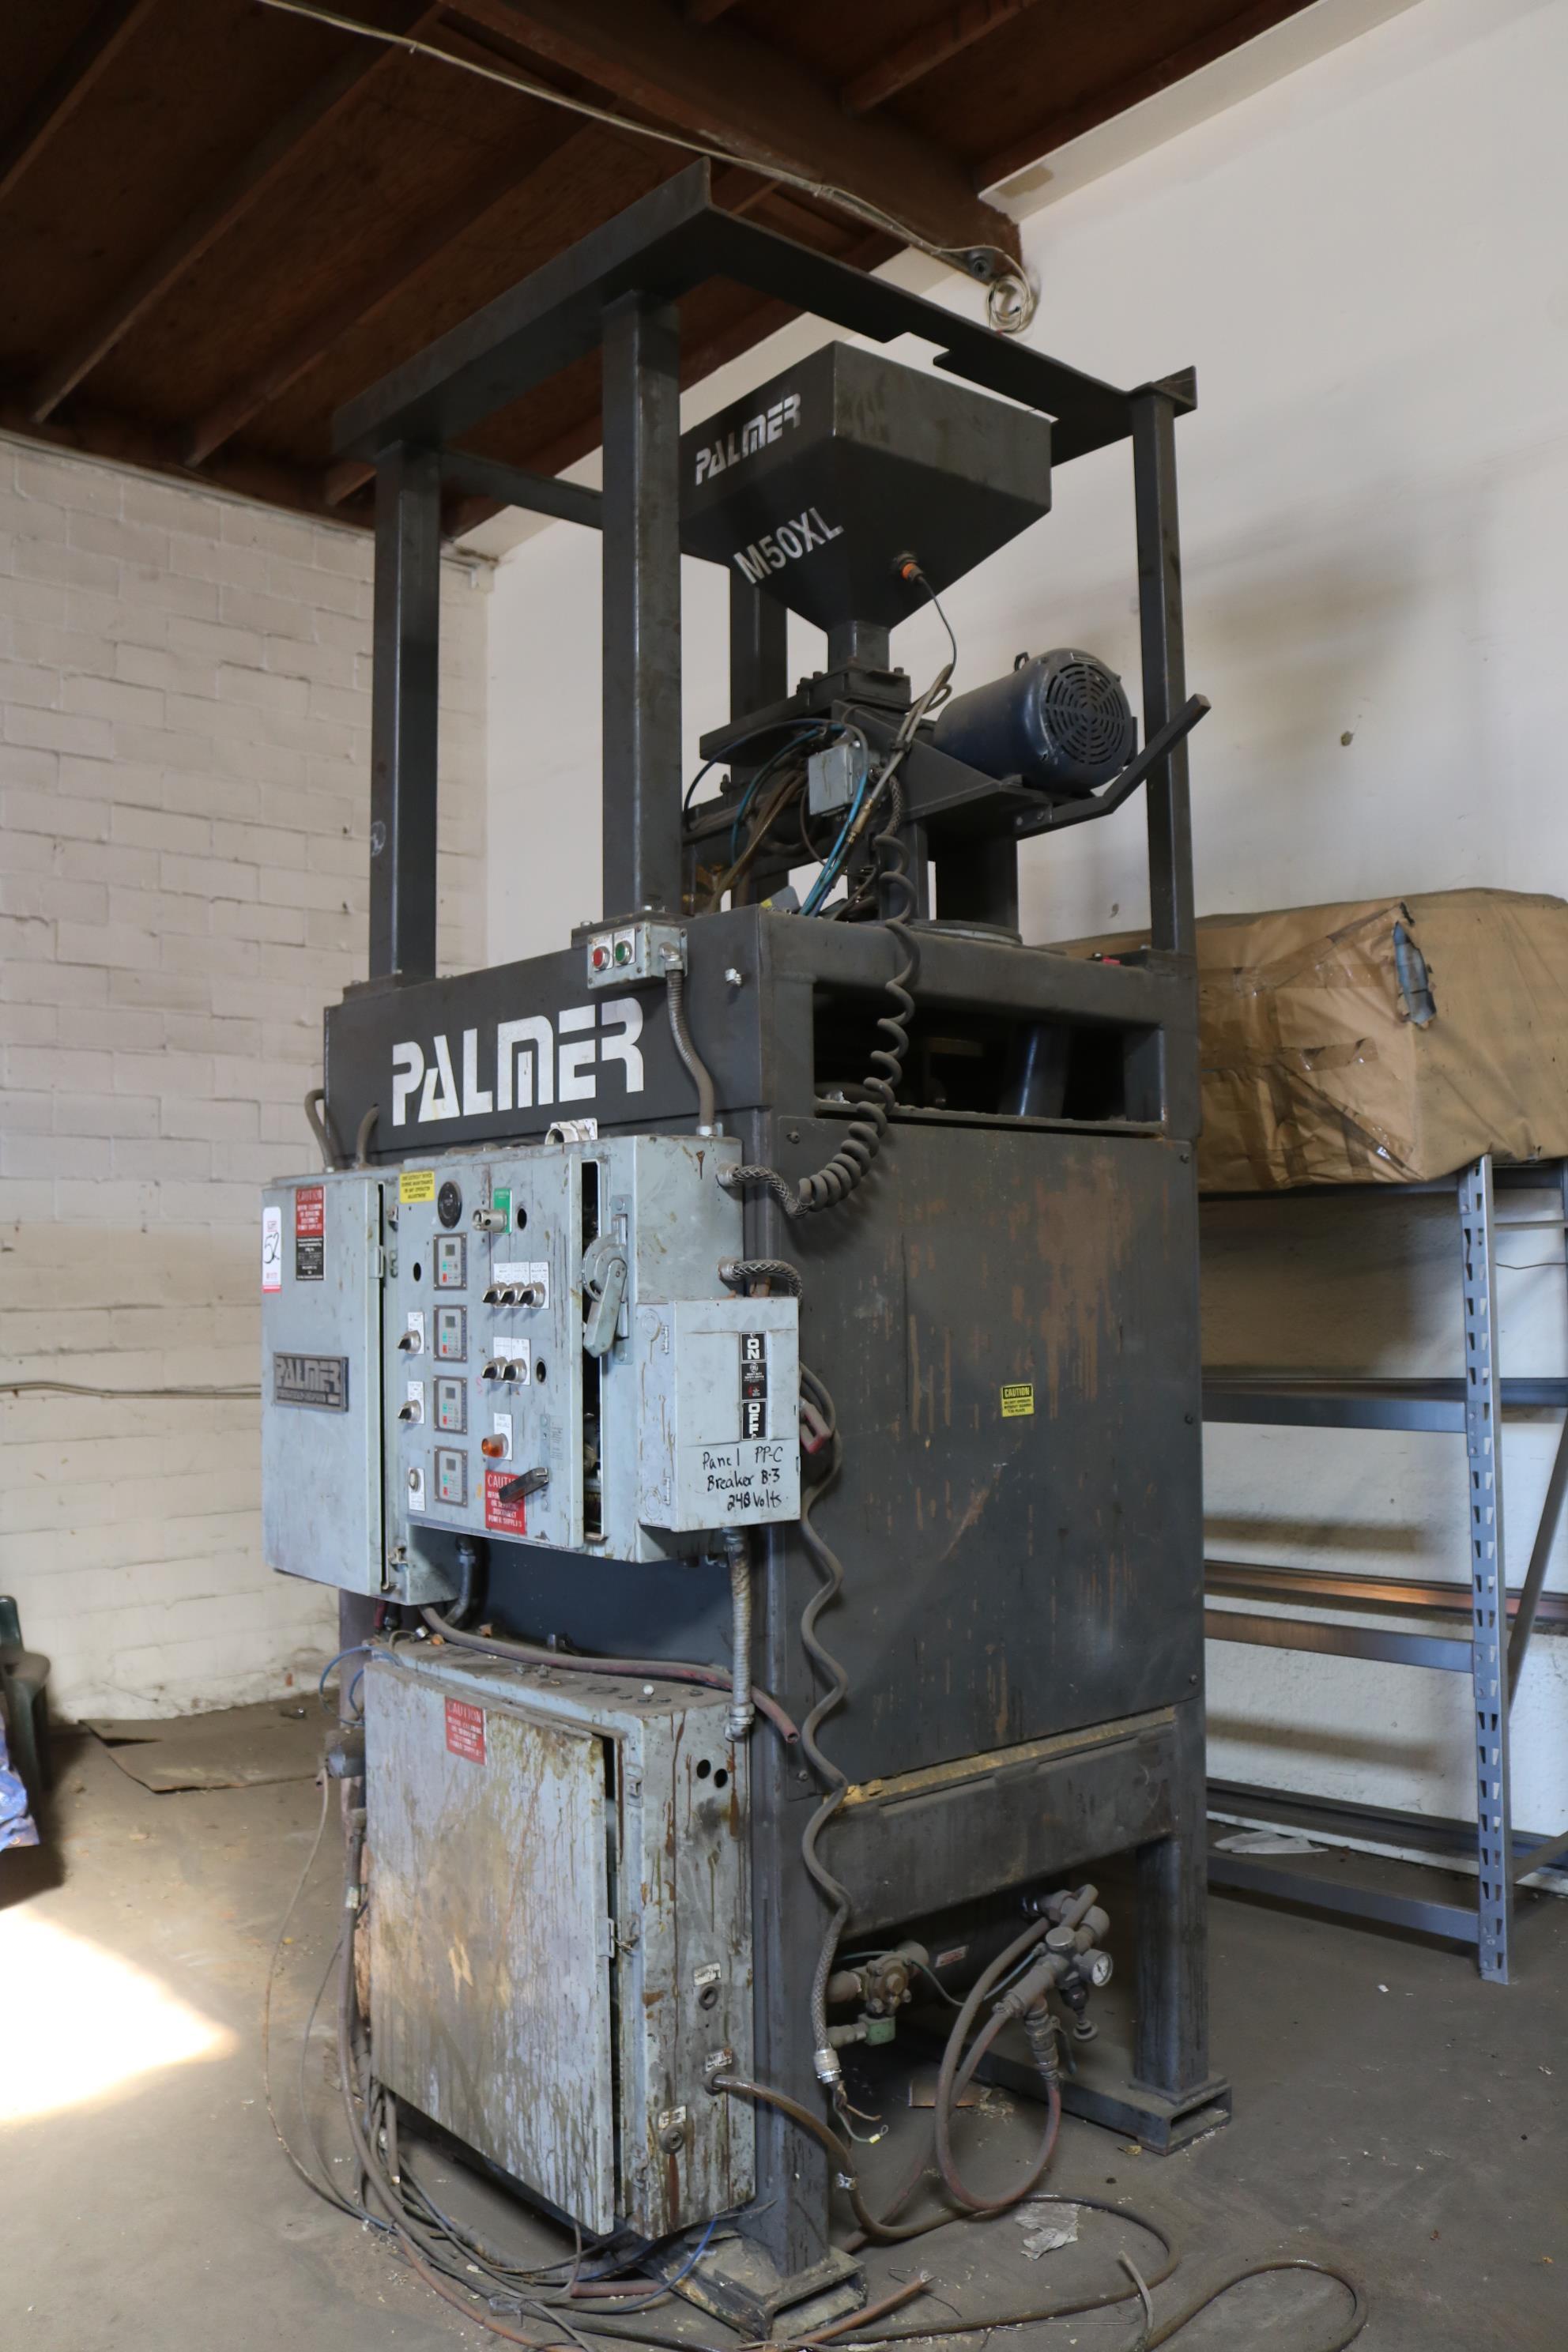 Lot 52 - 2005 PALMER MODEL CM25 CORE MAKER SYSTEM, PALMER M50XLD CONTINUOUS MIXER, ENCLOSURE, PUMPS AND